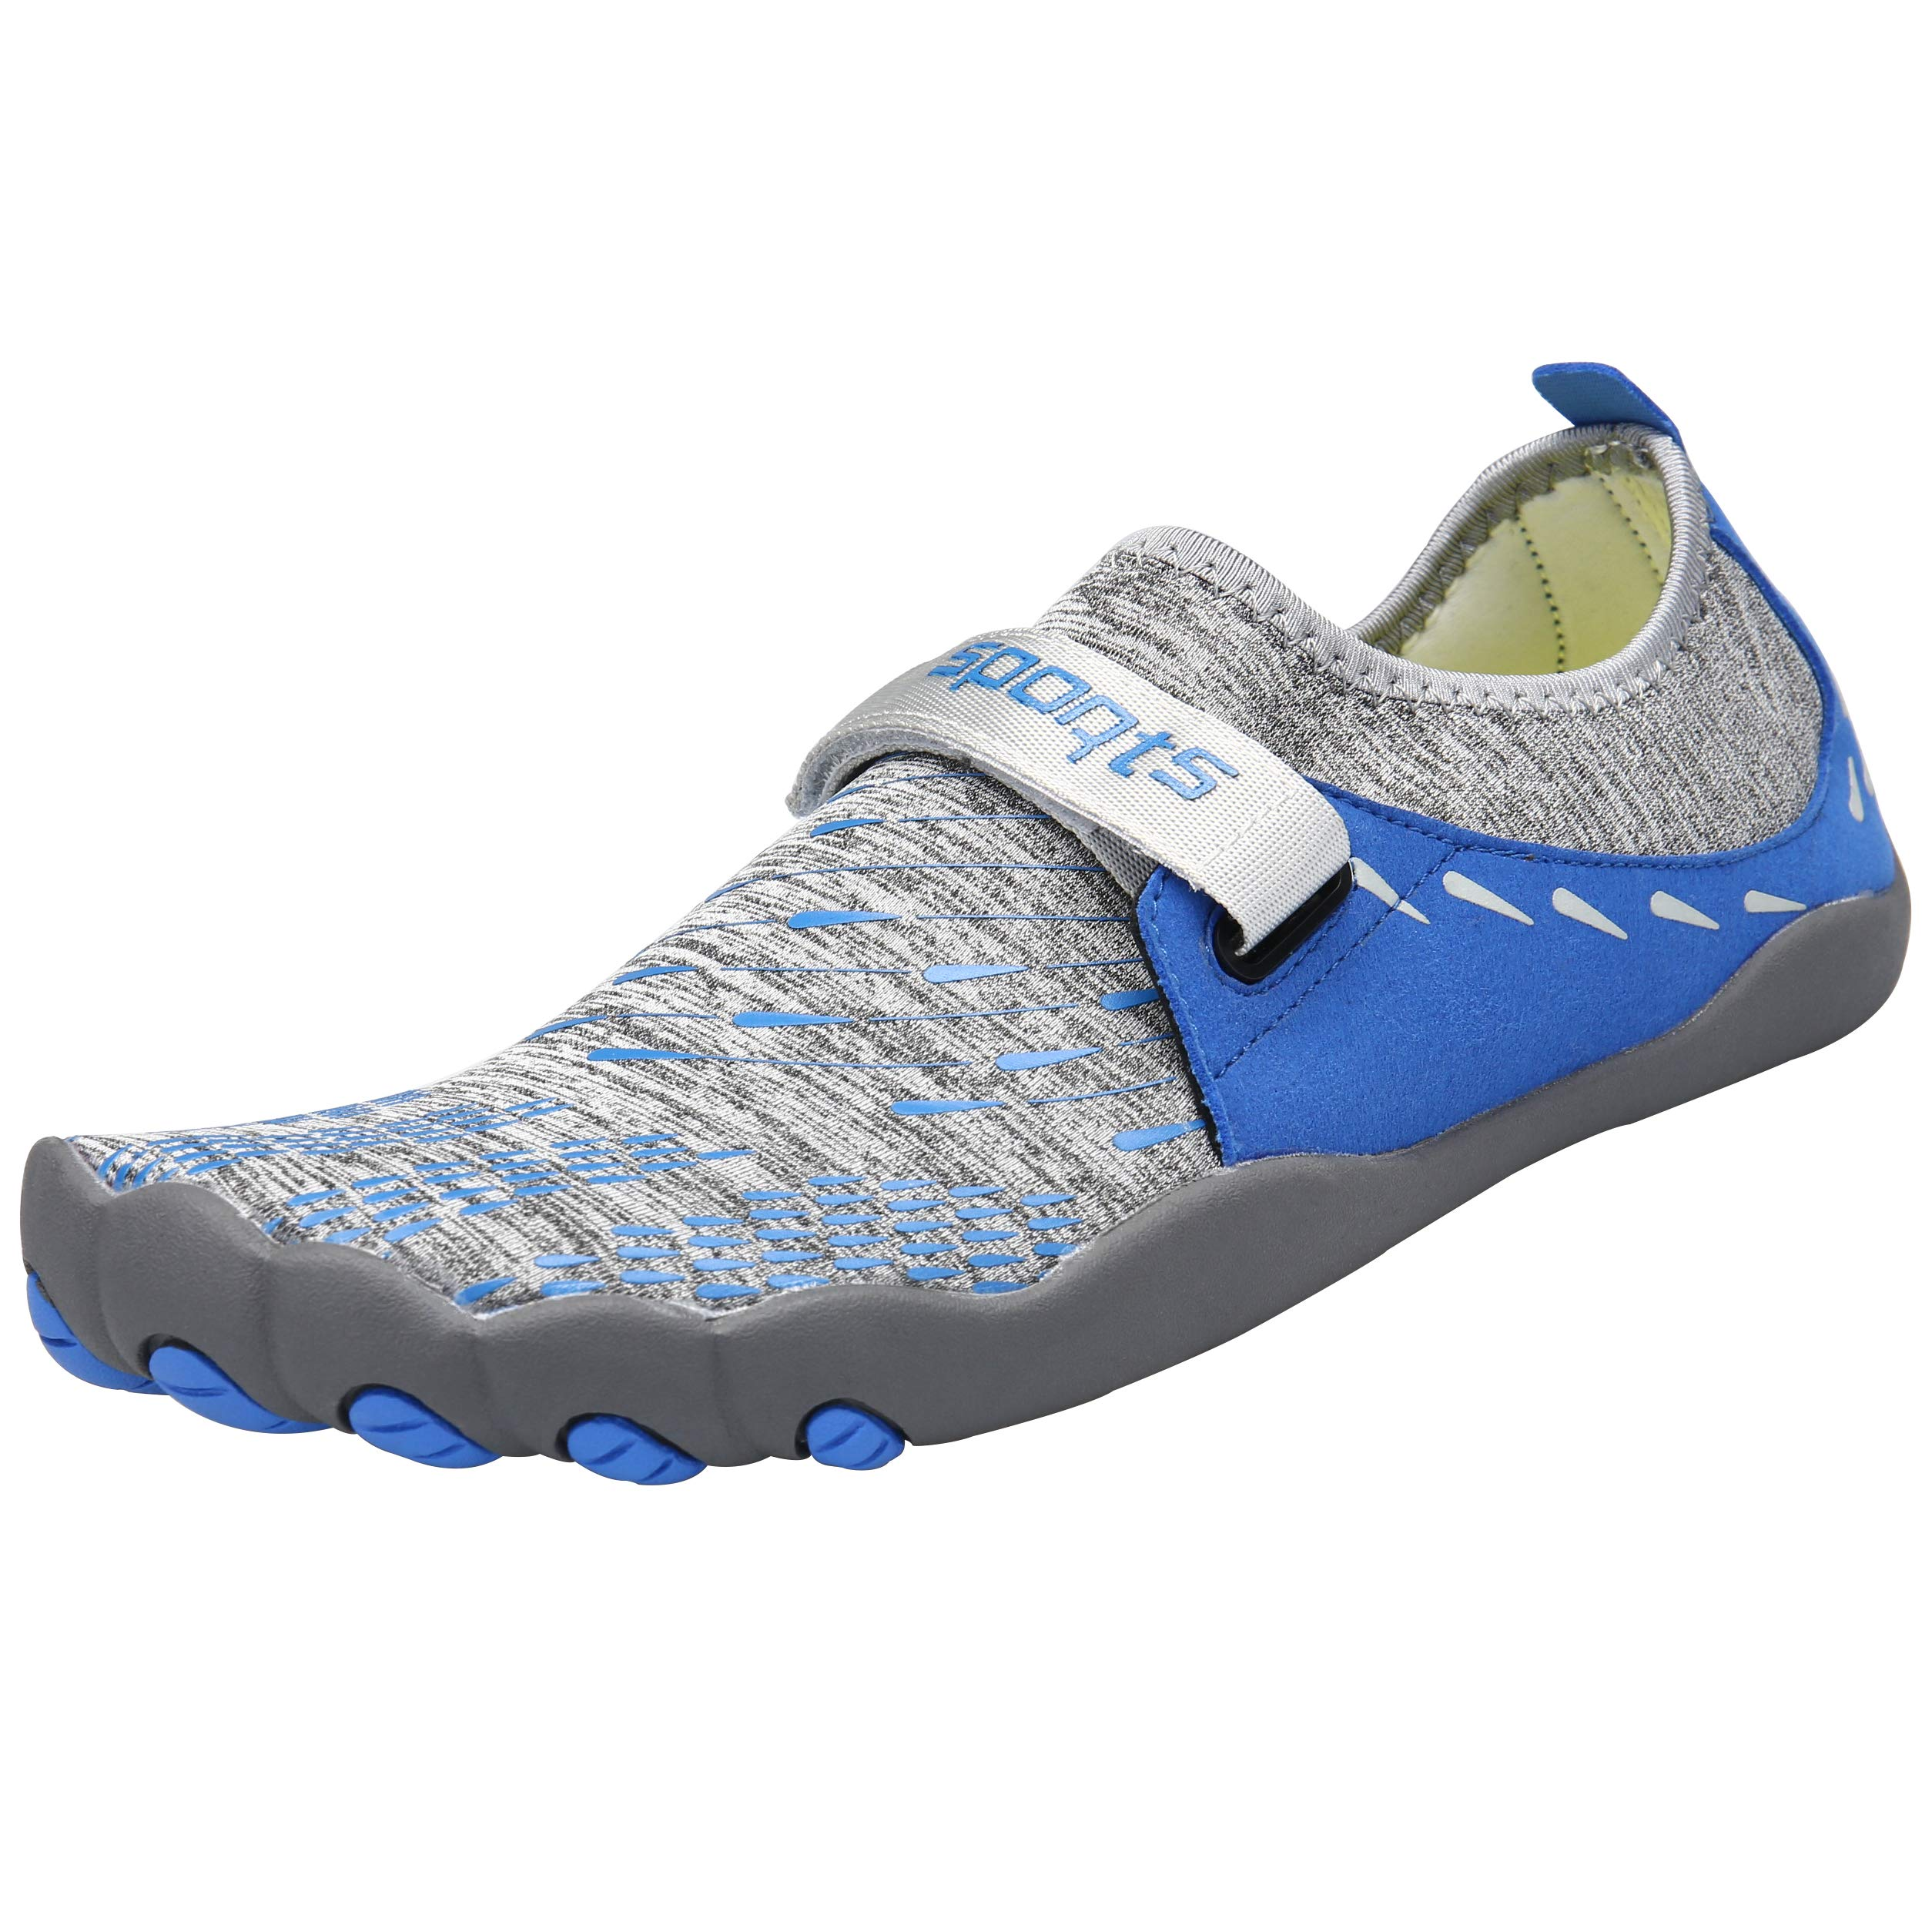 Zcoli Water Shoes for Women Men Barefoot Quick Dry Aqua Yoga Socks for Beach Swim Surf Diving Snorkeling Exercise